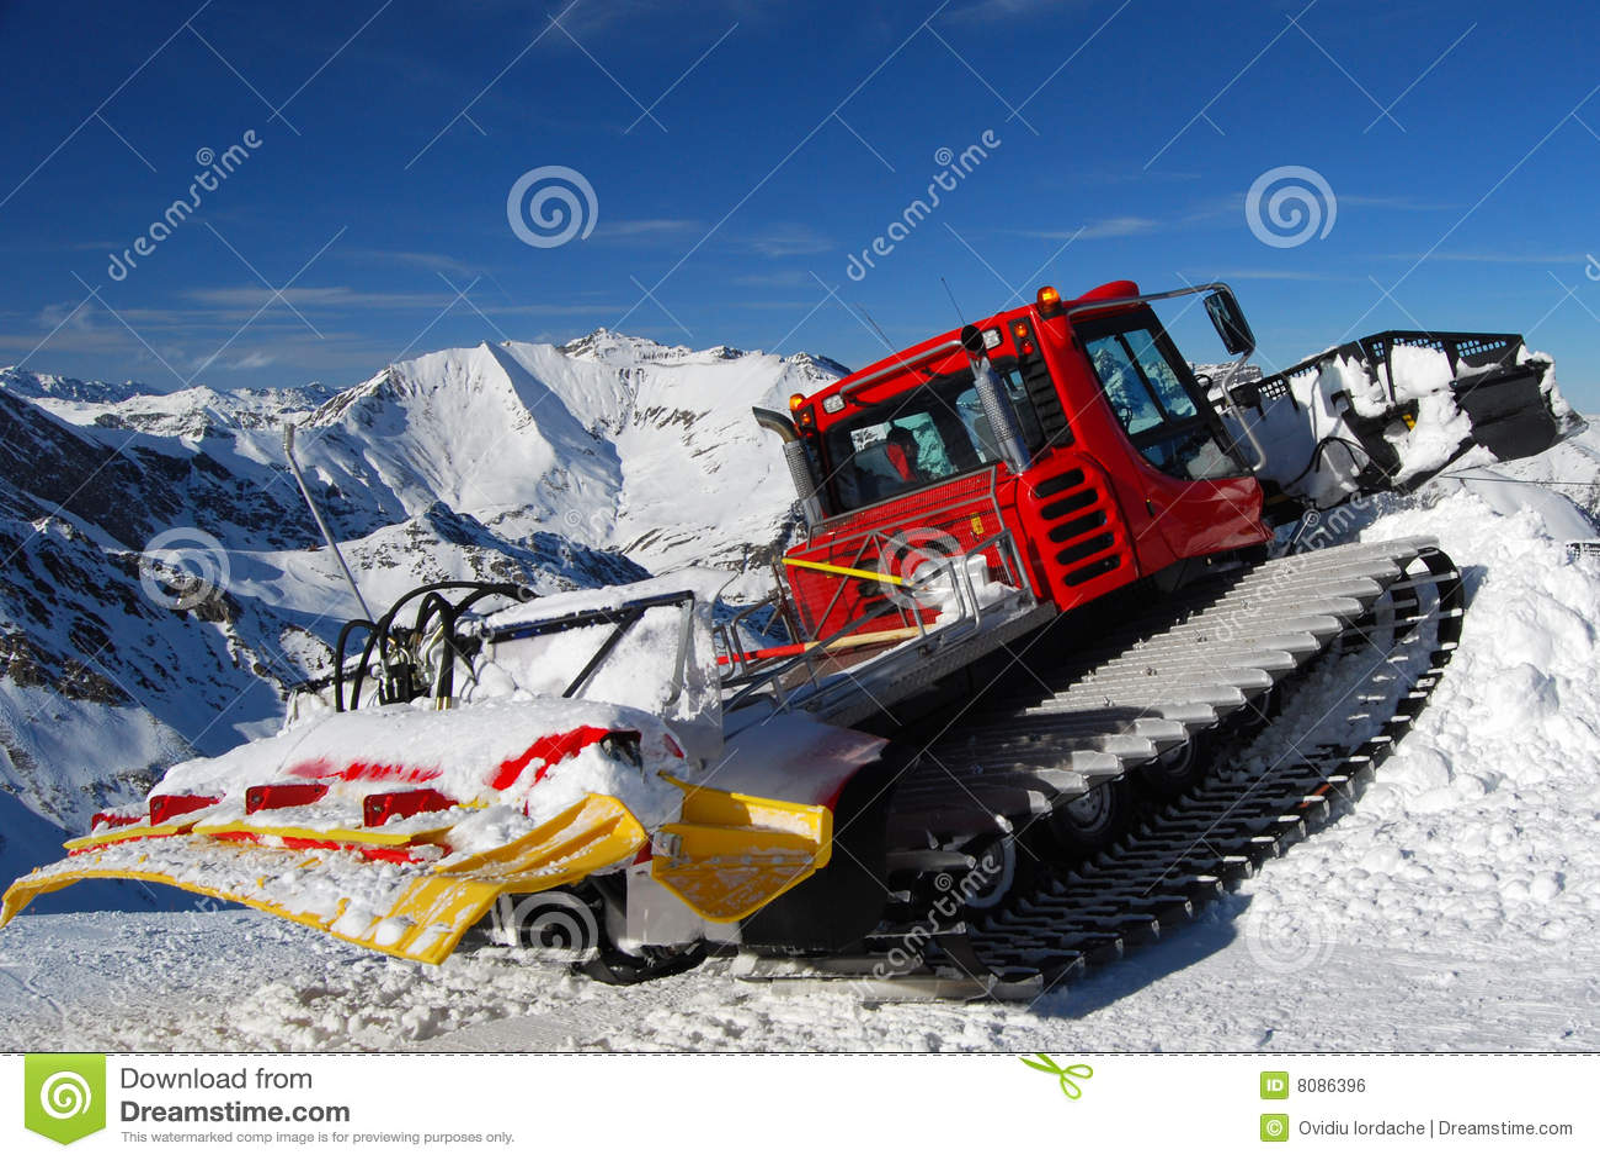 Ski Slope Dudes Ploughing